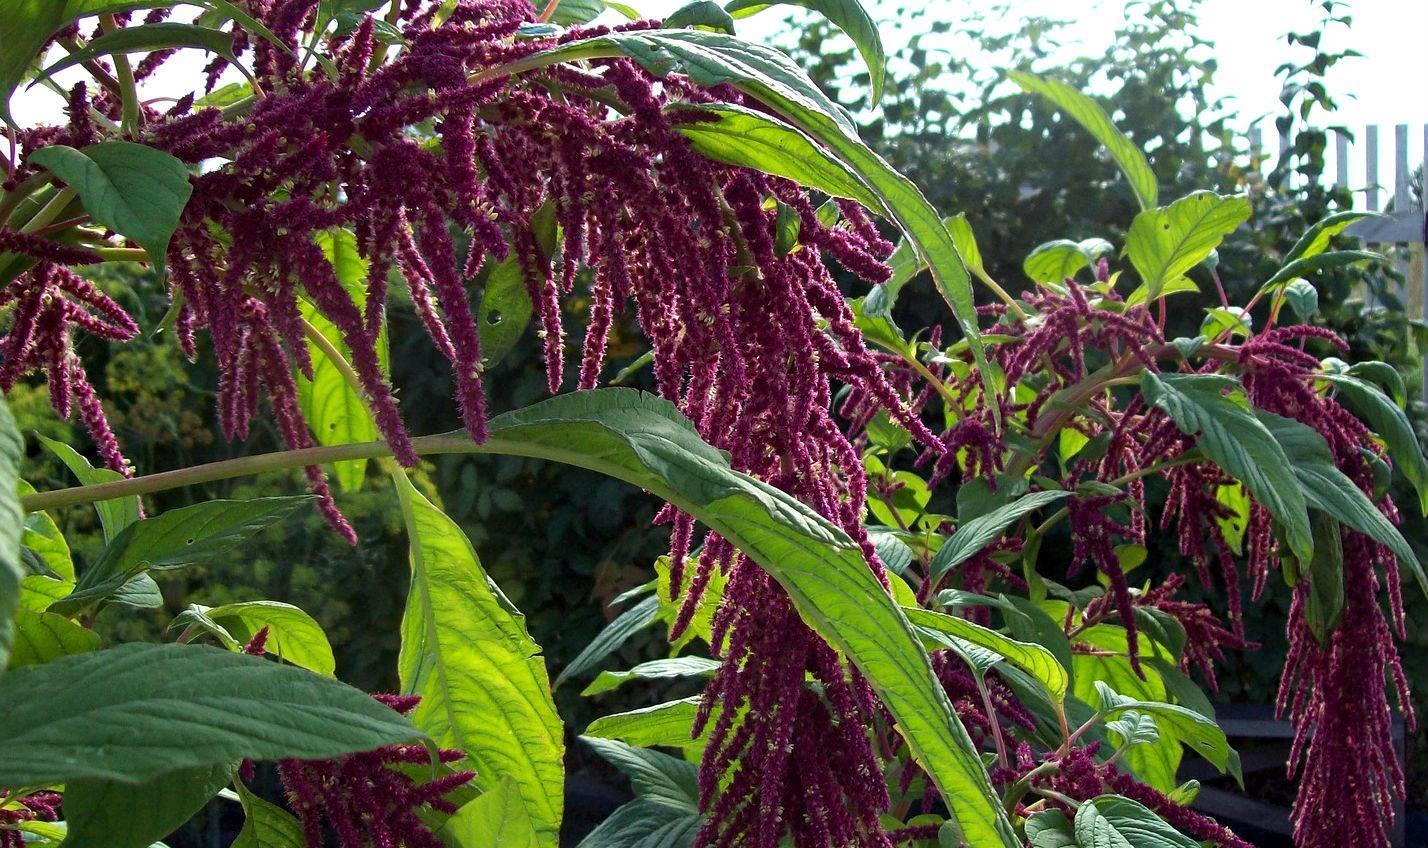 Цветок амарант: посадка и уход в открытом грунте, фото, выращивание, свойства